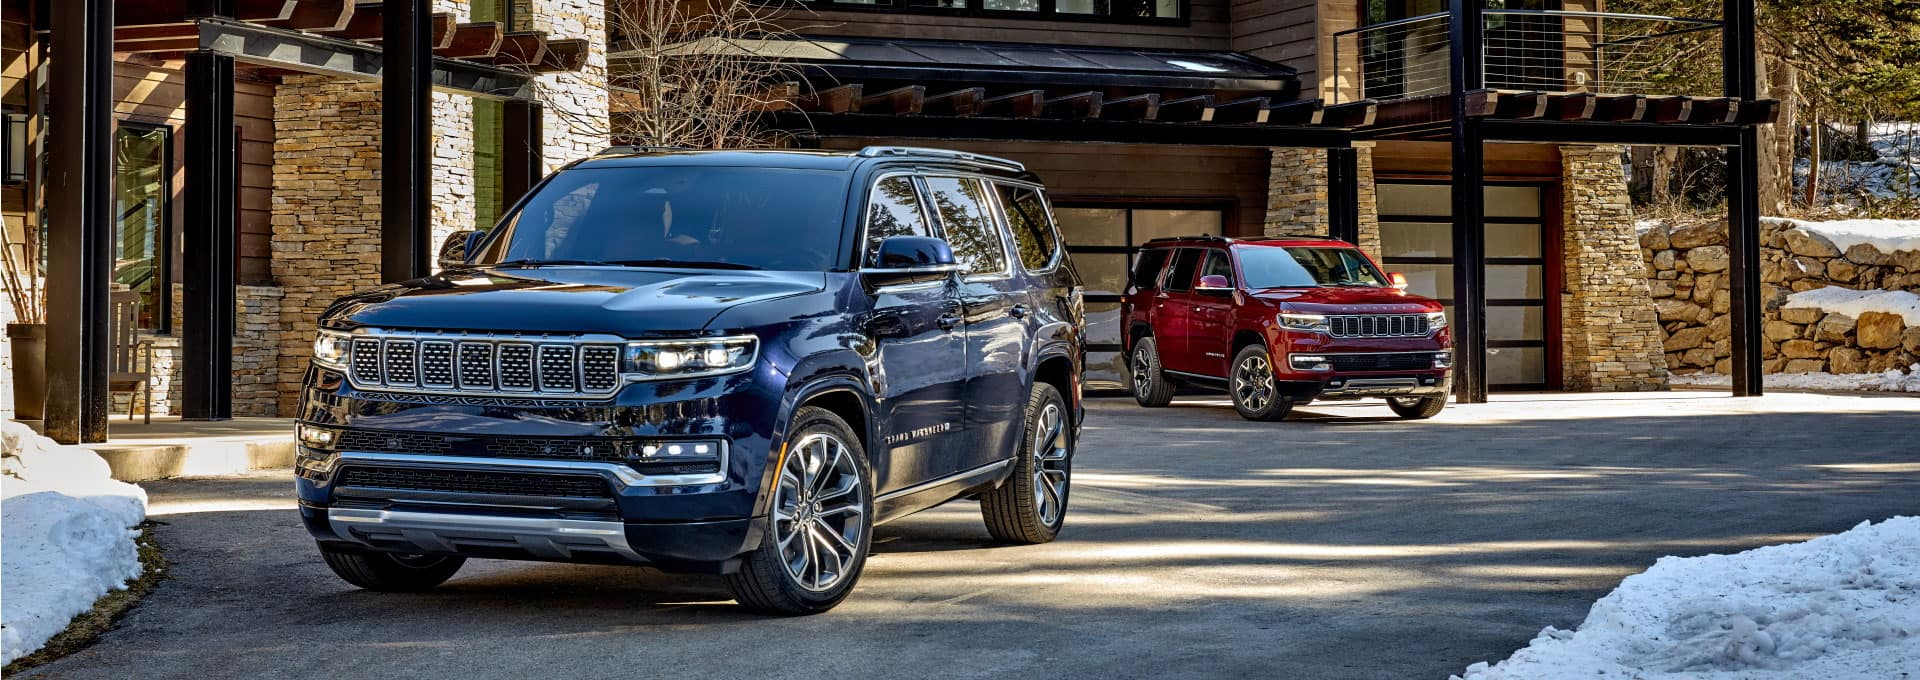 2022 Jeep Grand Wagoneer & 2022 Jeep Wagoneer